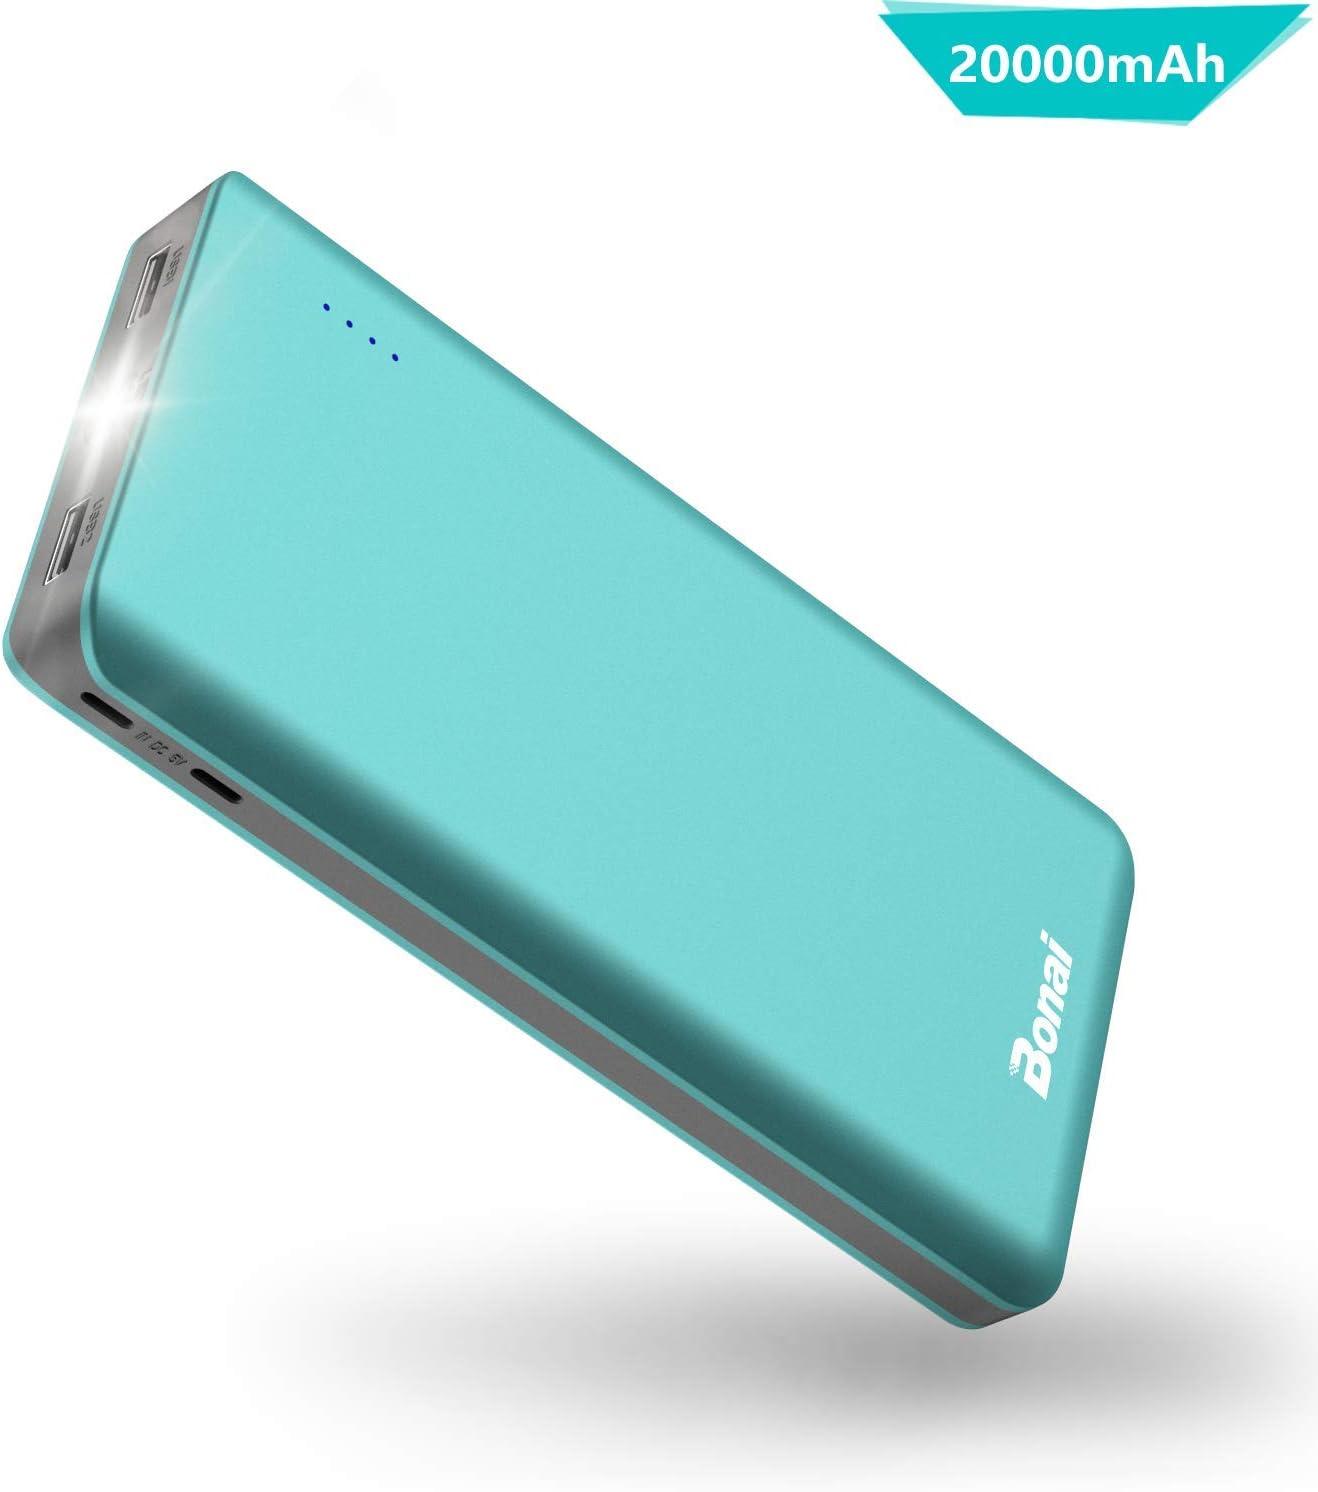 Bonai Fast Phone Portable Charger